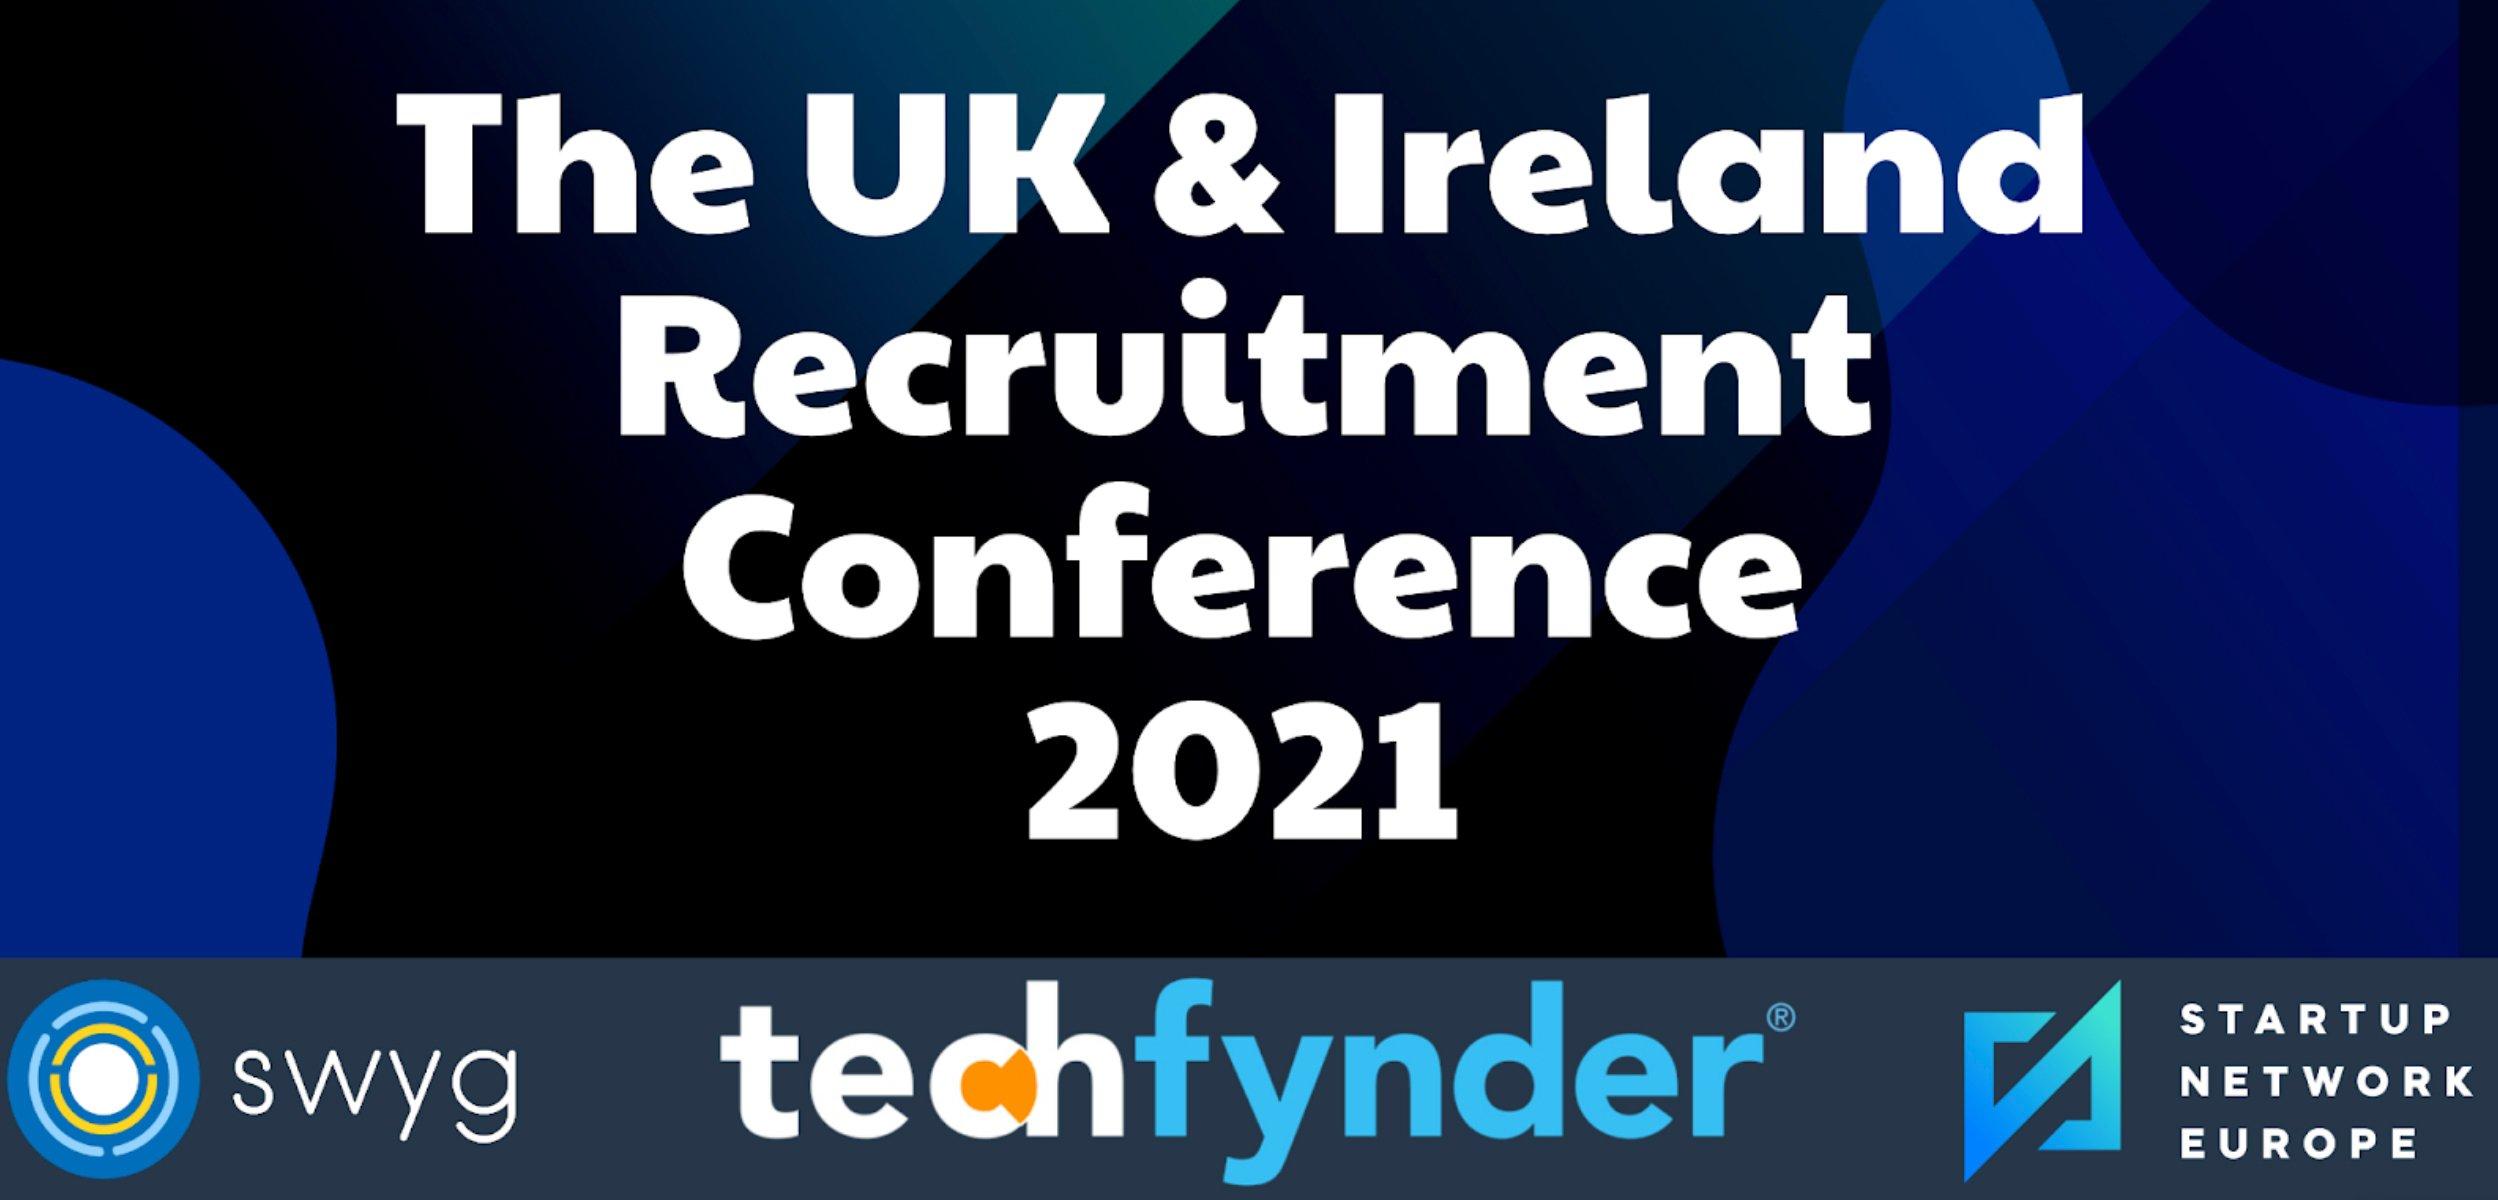 Techfynder2-The-UK-Ireland-Recruitment-Conference-2021